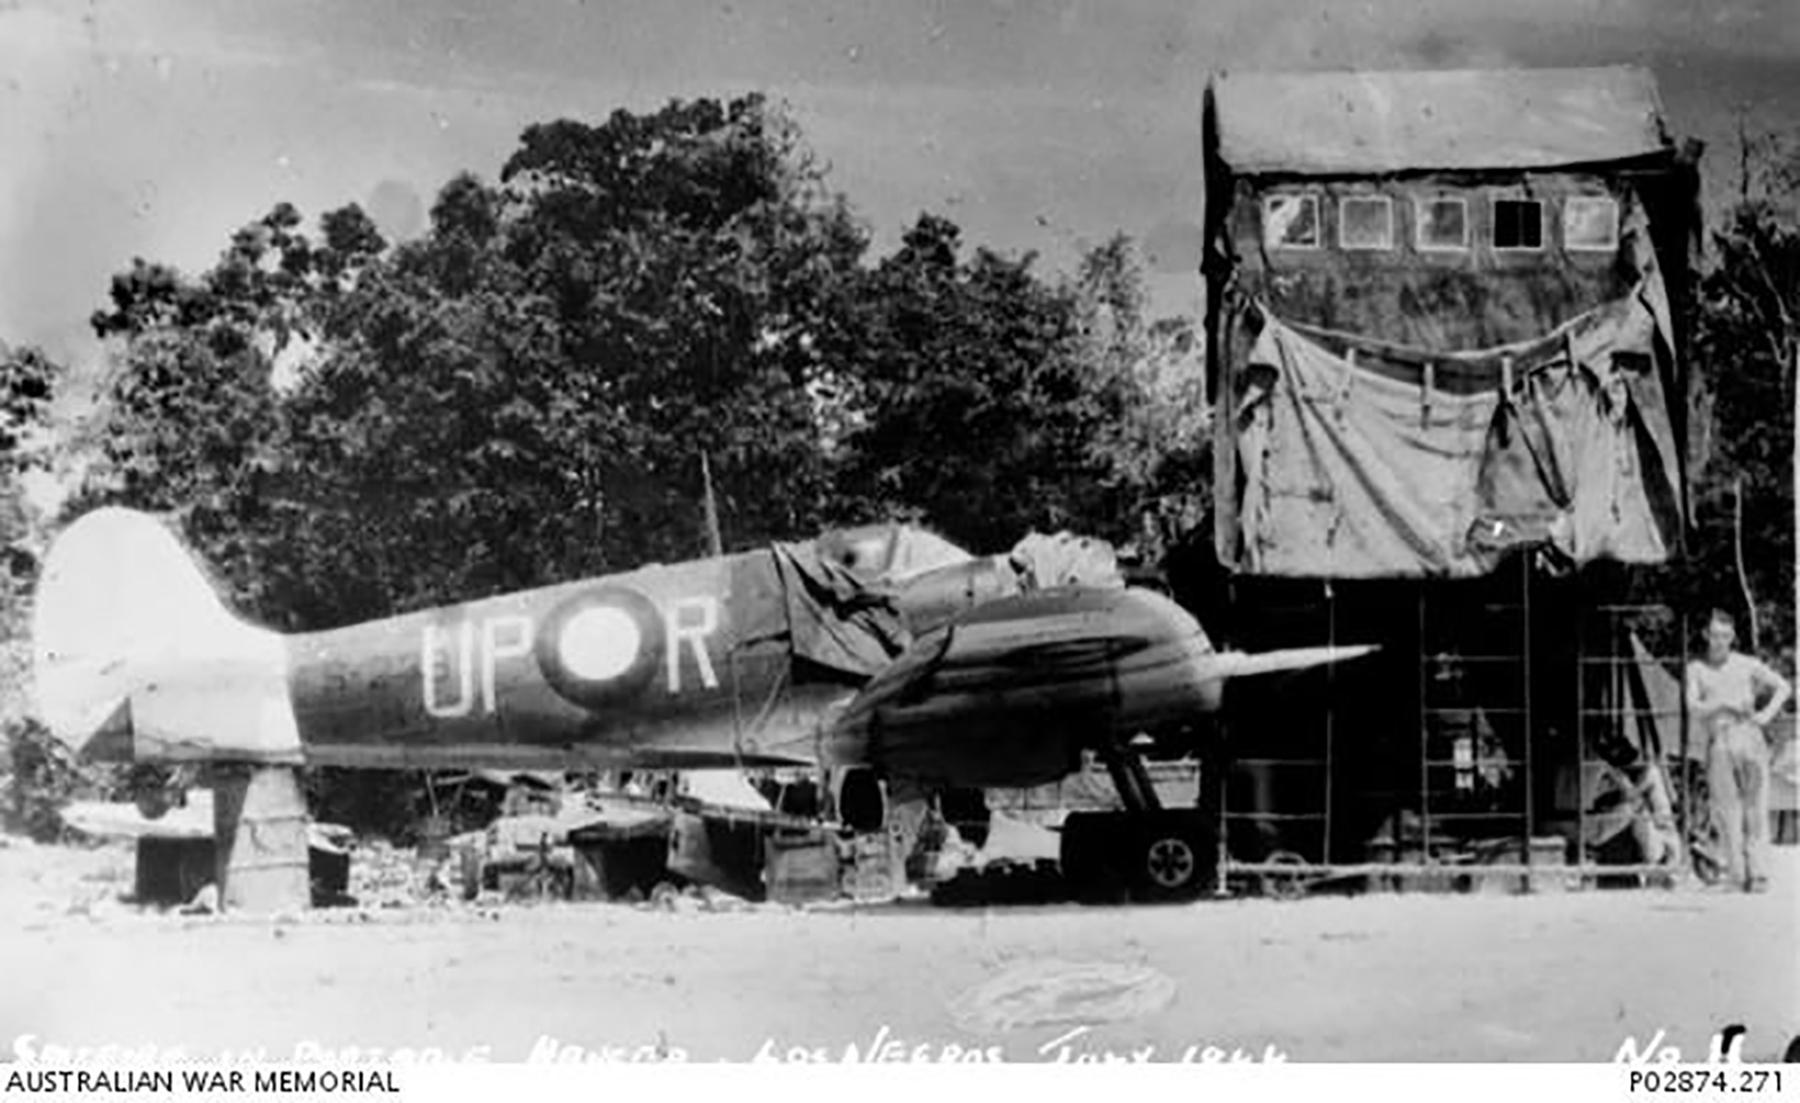 Spitfire MkVc RAAF 79Sqn UPR A58 166 undergoing major maintenance Los Negros IWM 01